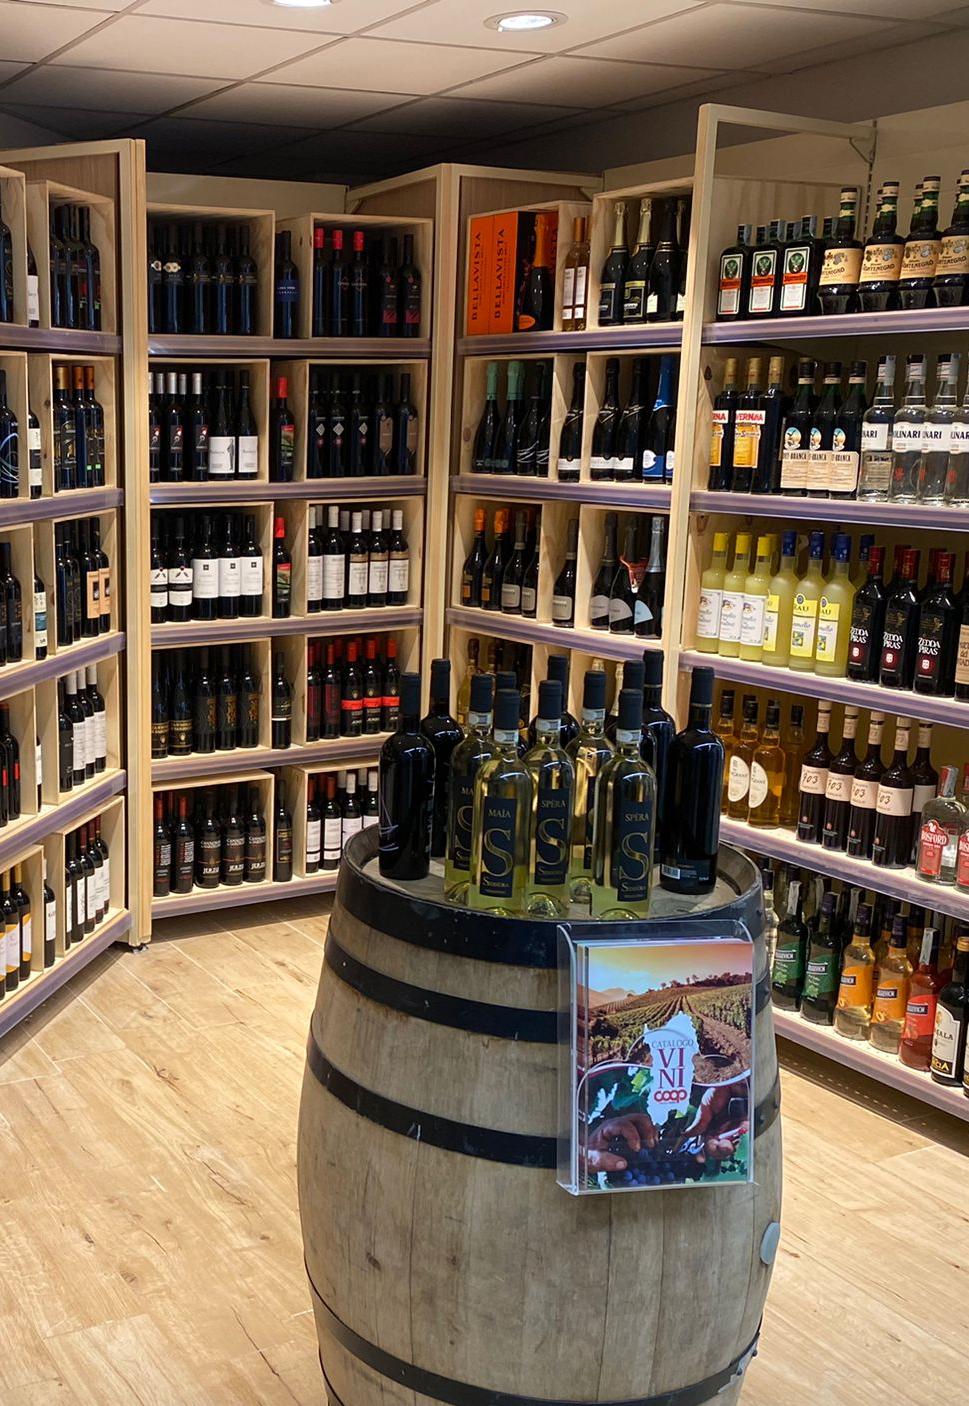 Coop Master di Sardegna rinnova il punto vendita a Quartu Sant'Elena